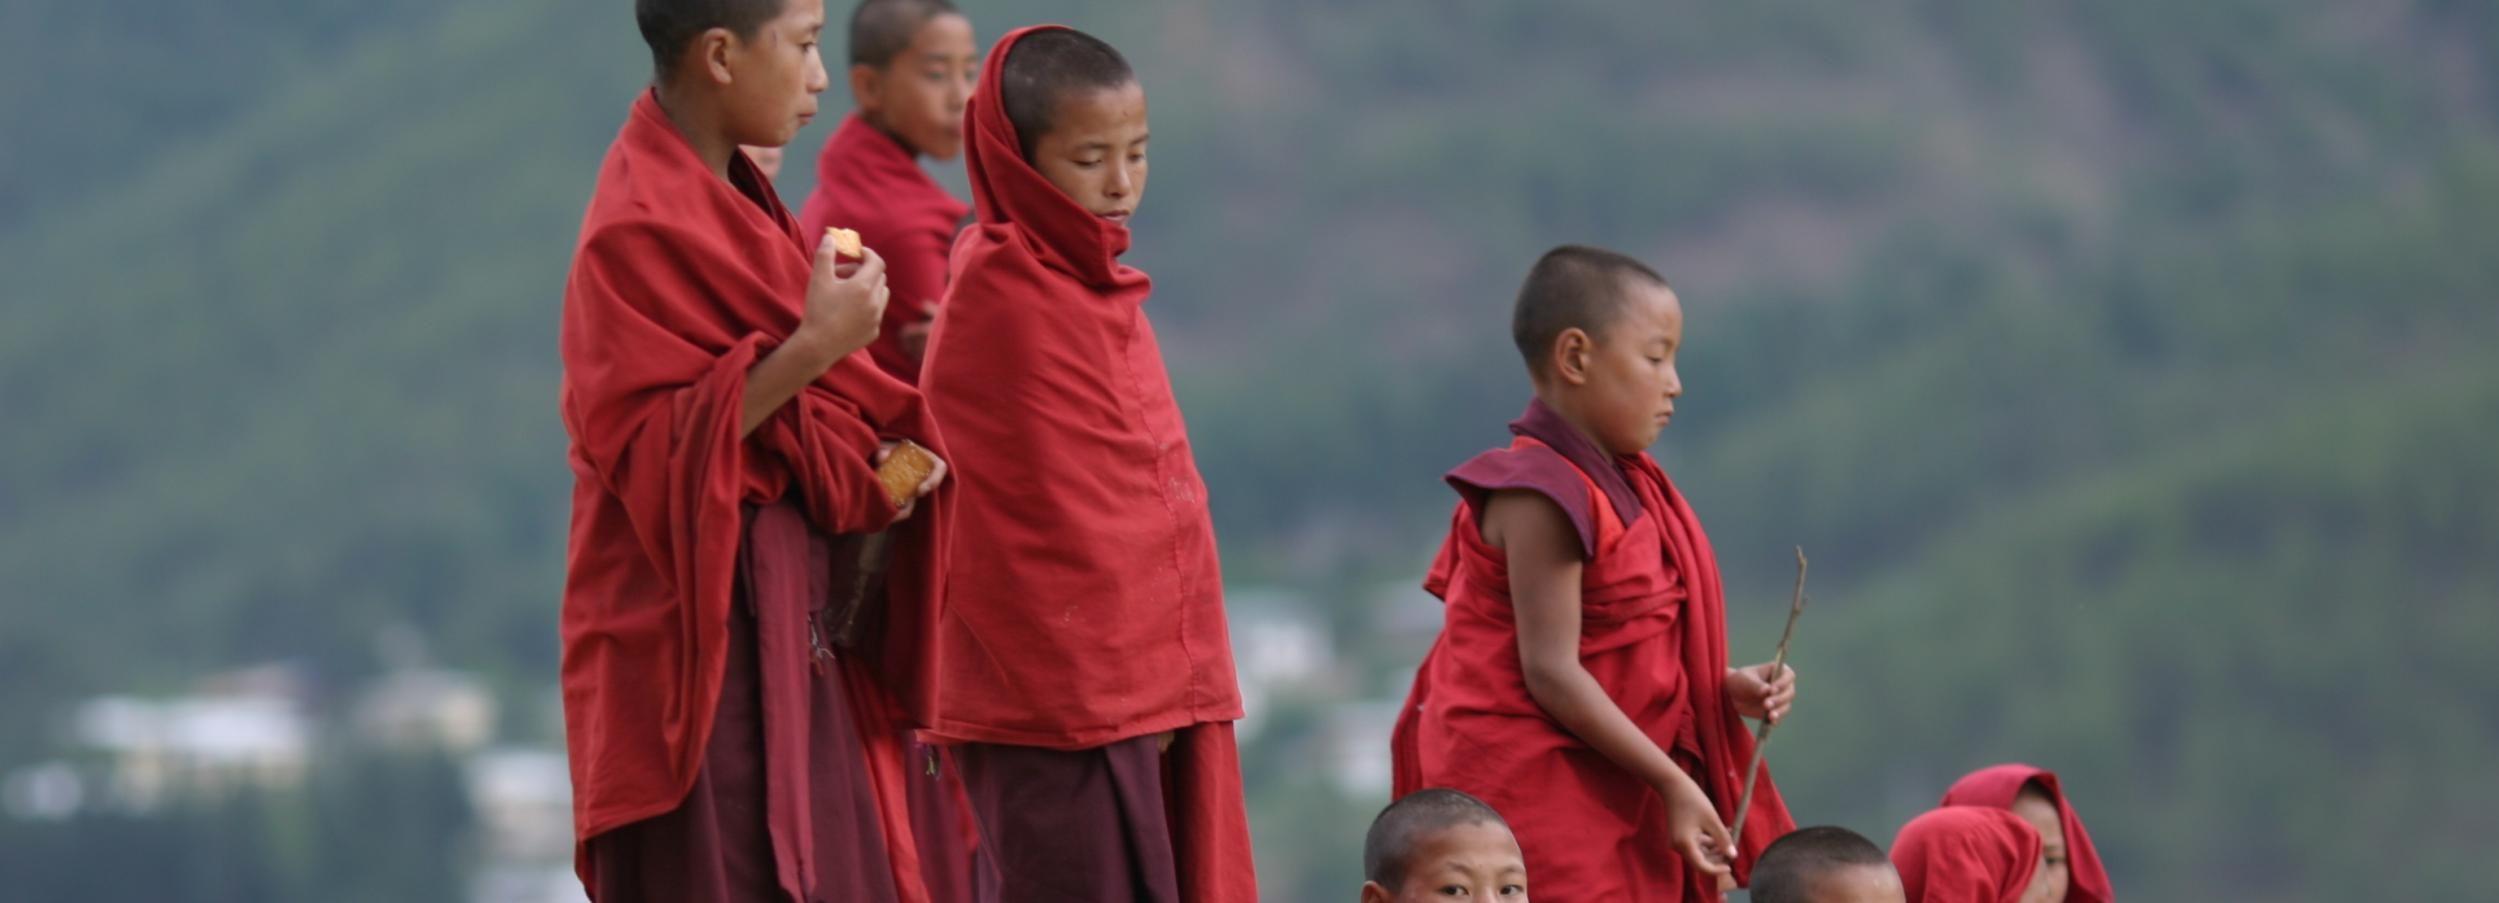 Bhutan: 7 Day All Inclusive Himalayan Kingdom of Bhutan Tour